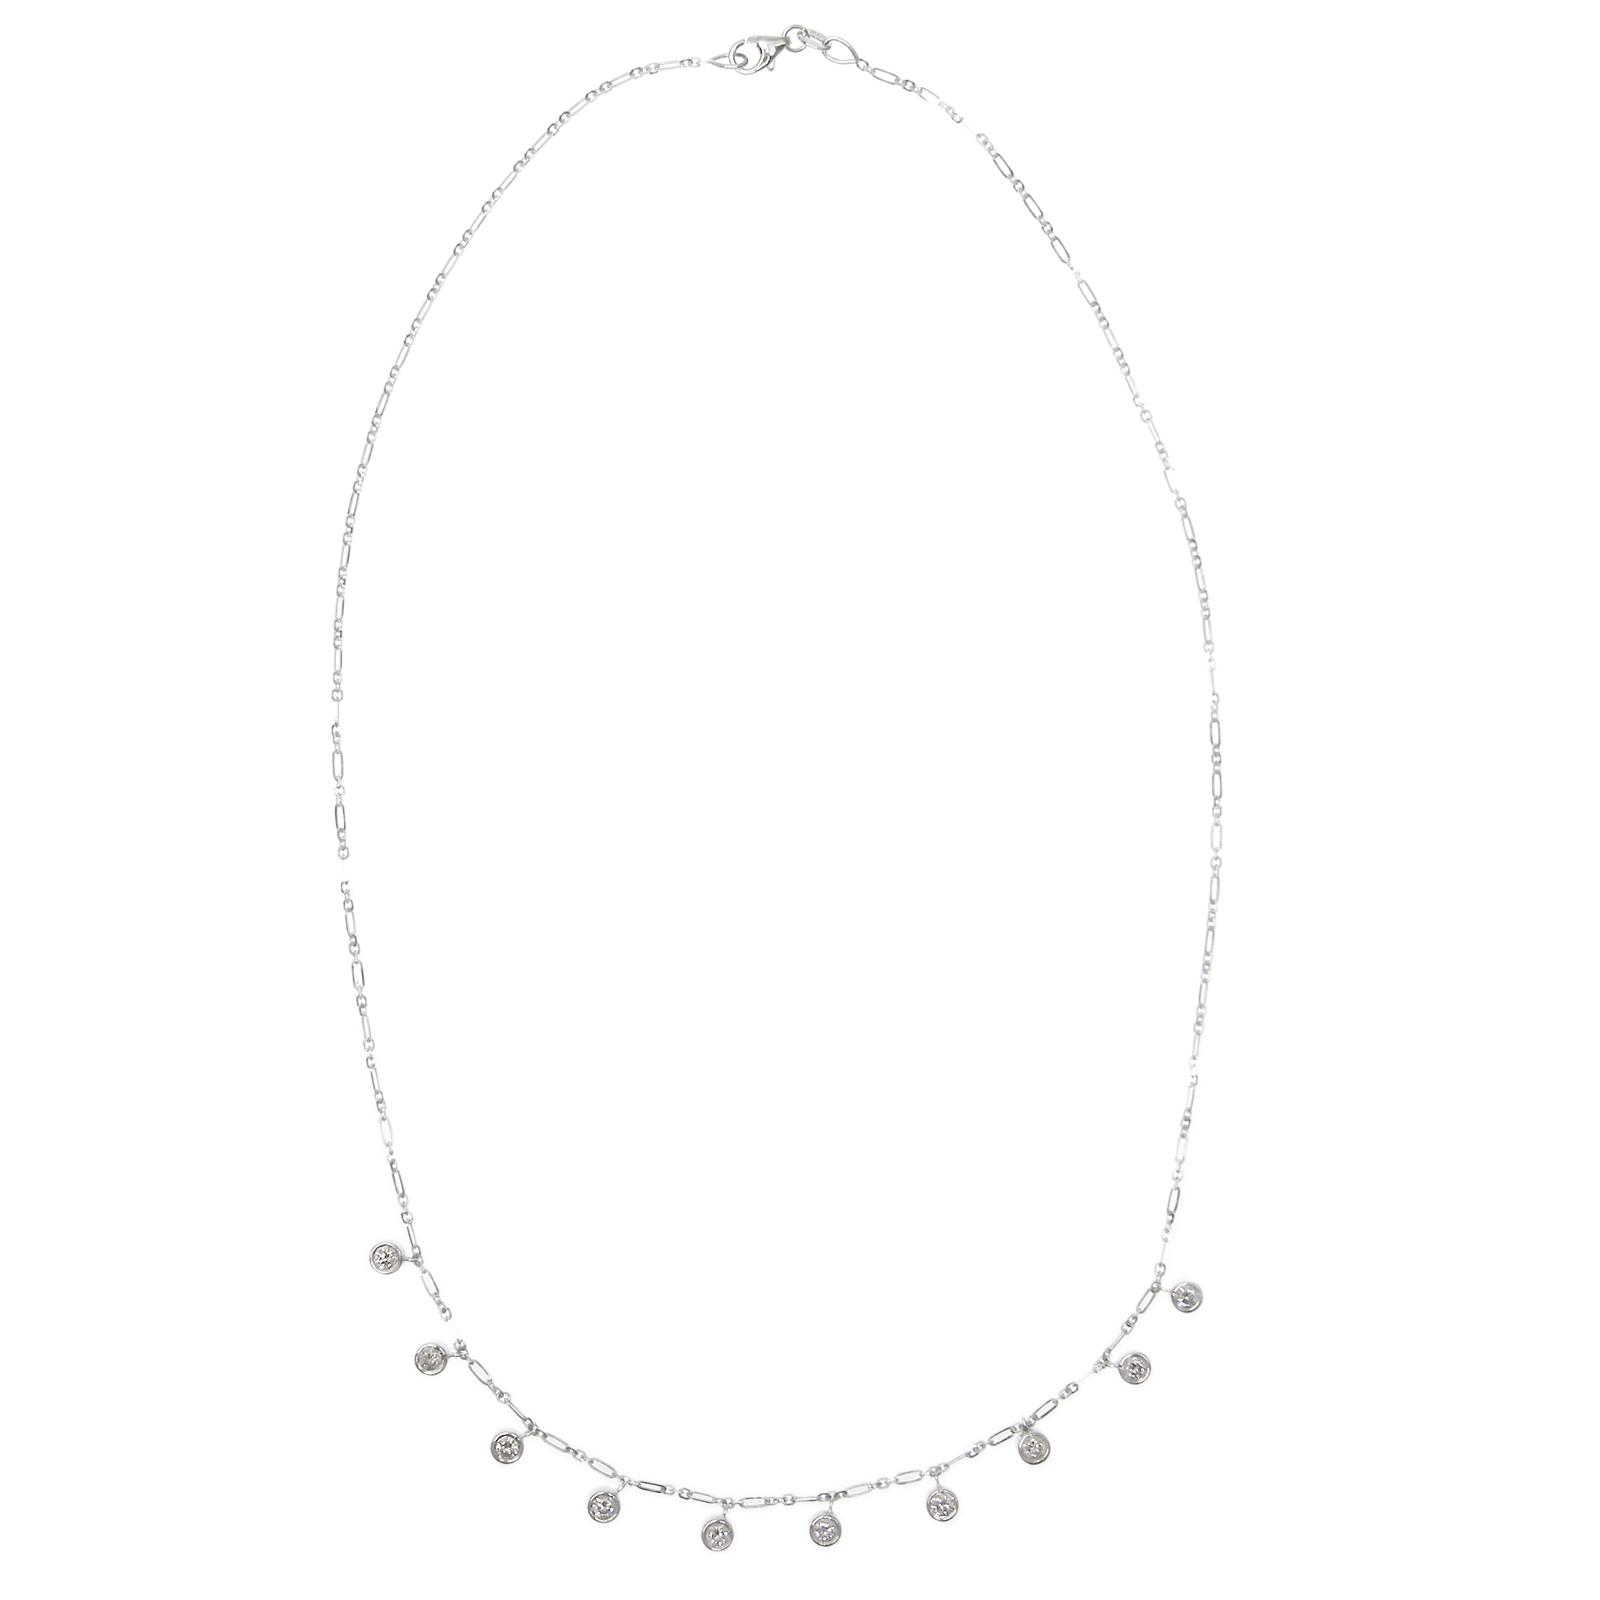 SIGNATURE DIAMOND DANGLE NECKLACE CLUSTER DIAMOND PENDANT BESPOKE FINE JEWELLERY BY SHAHINA HATTA